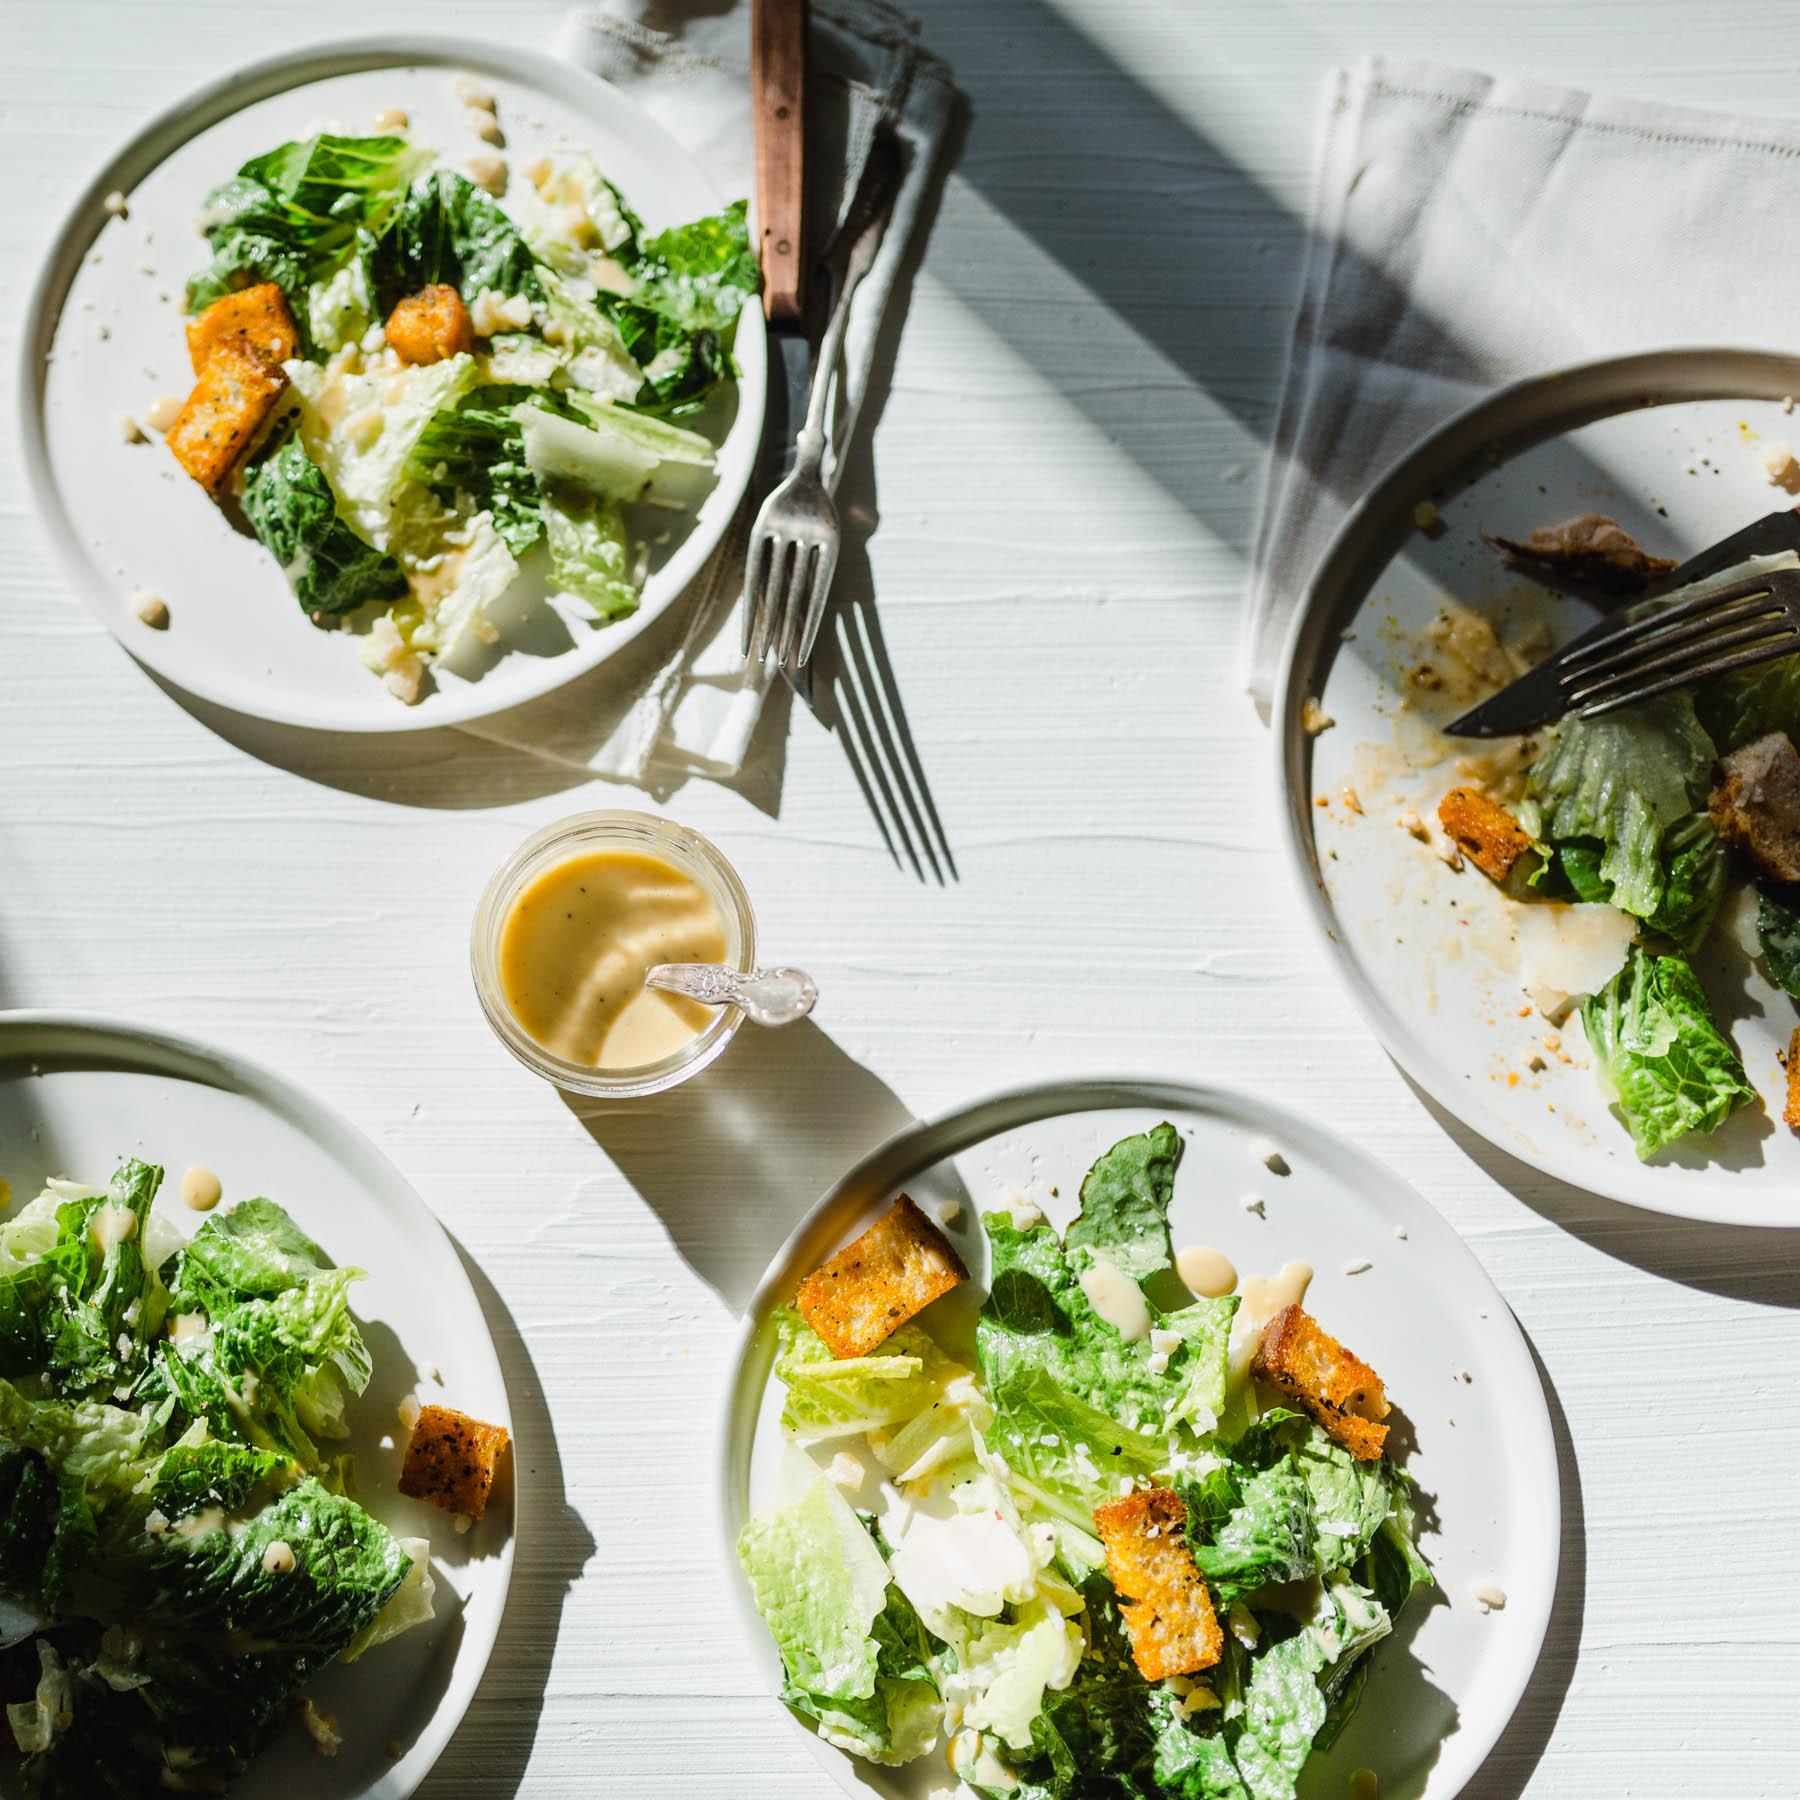 chicago-nyc-food-lifestyle-photographer-4.jpg